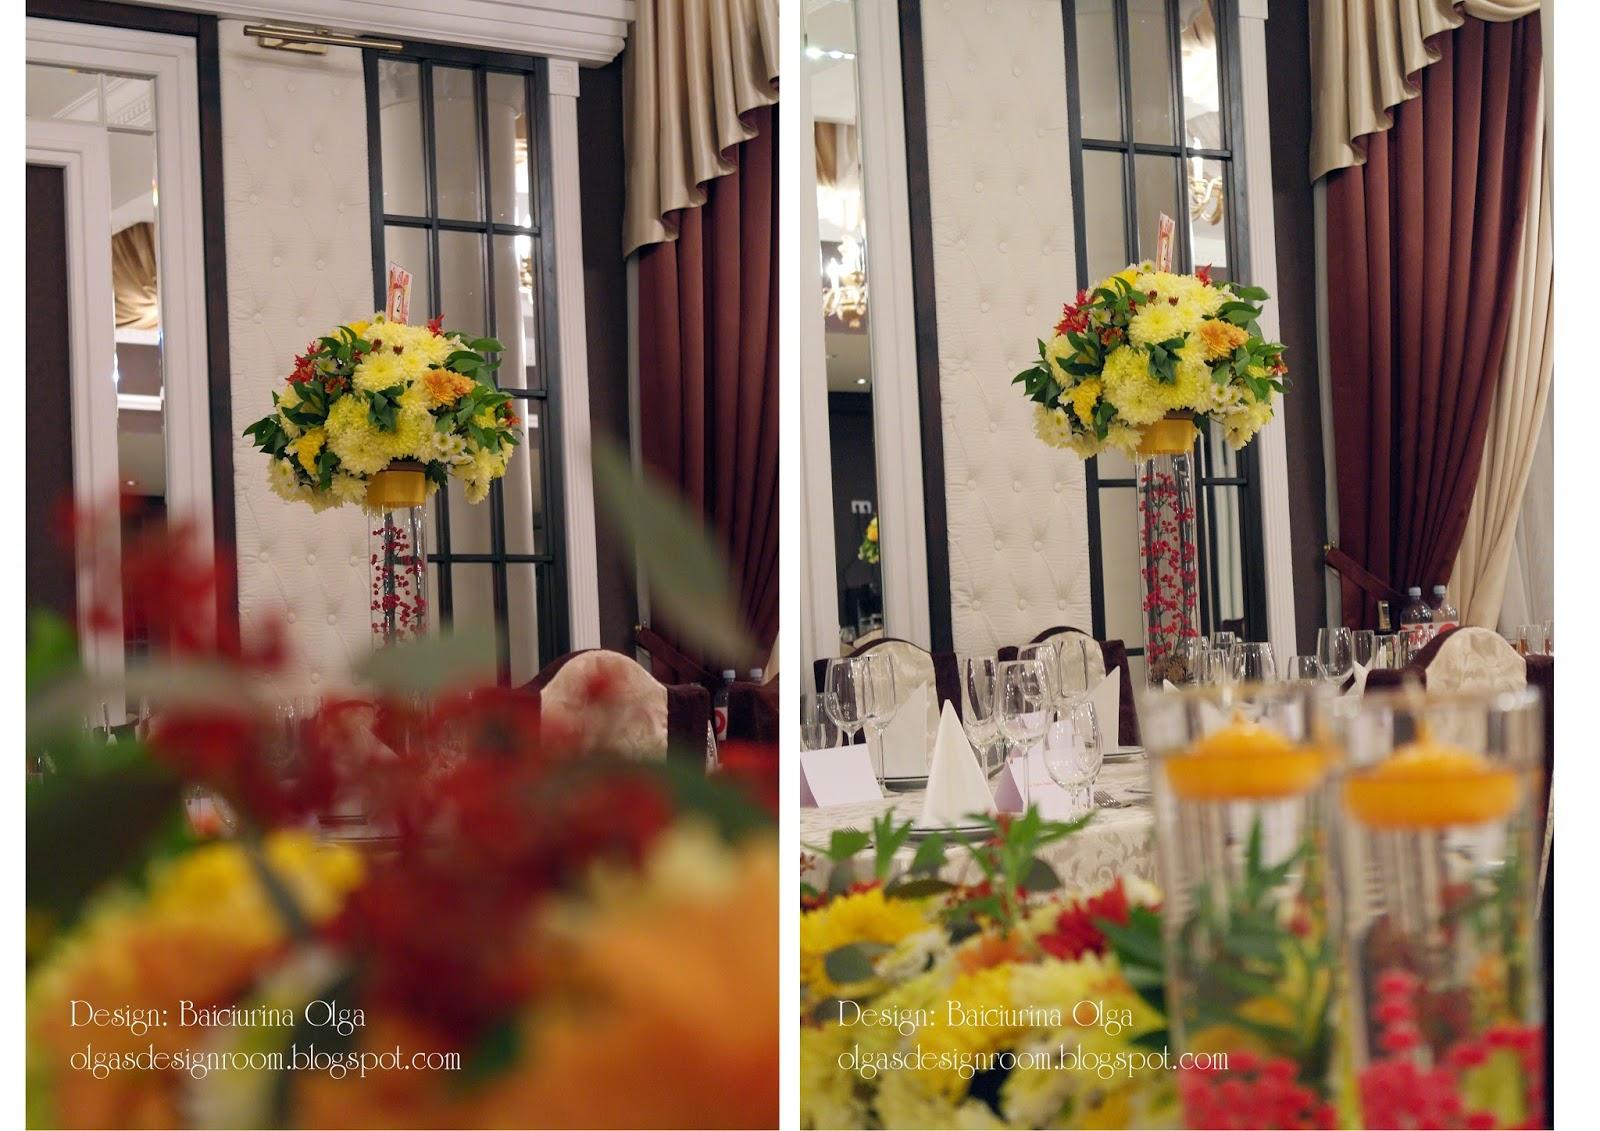 Осенняя свадьба оформление фото